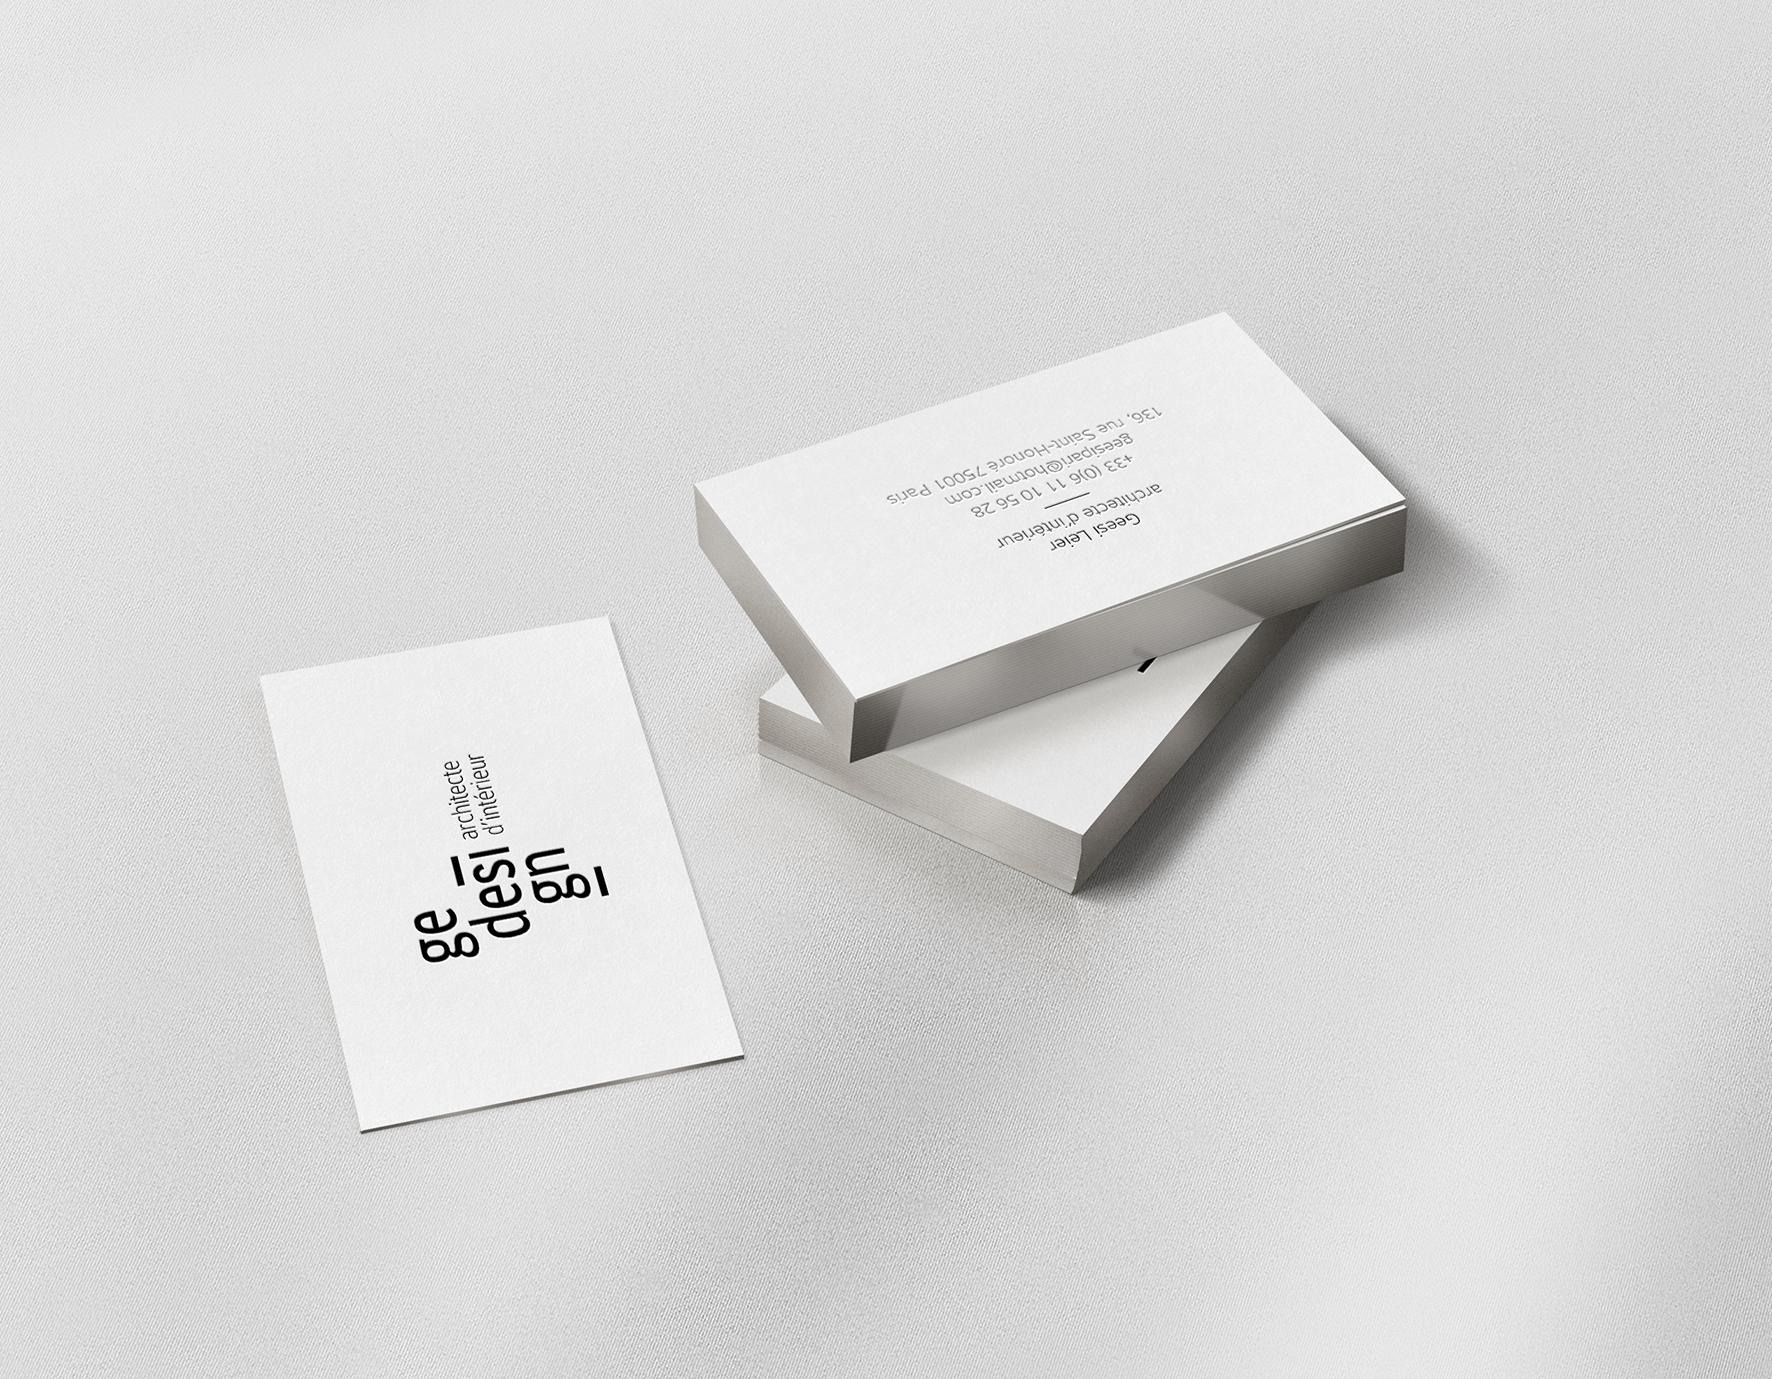 DOROTADOLENC_02 stationery_GEDESIGN_letterpress Bcard